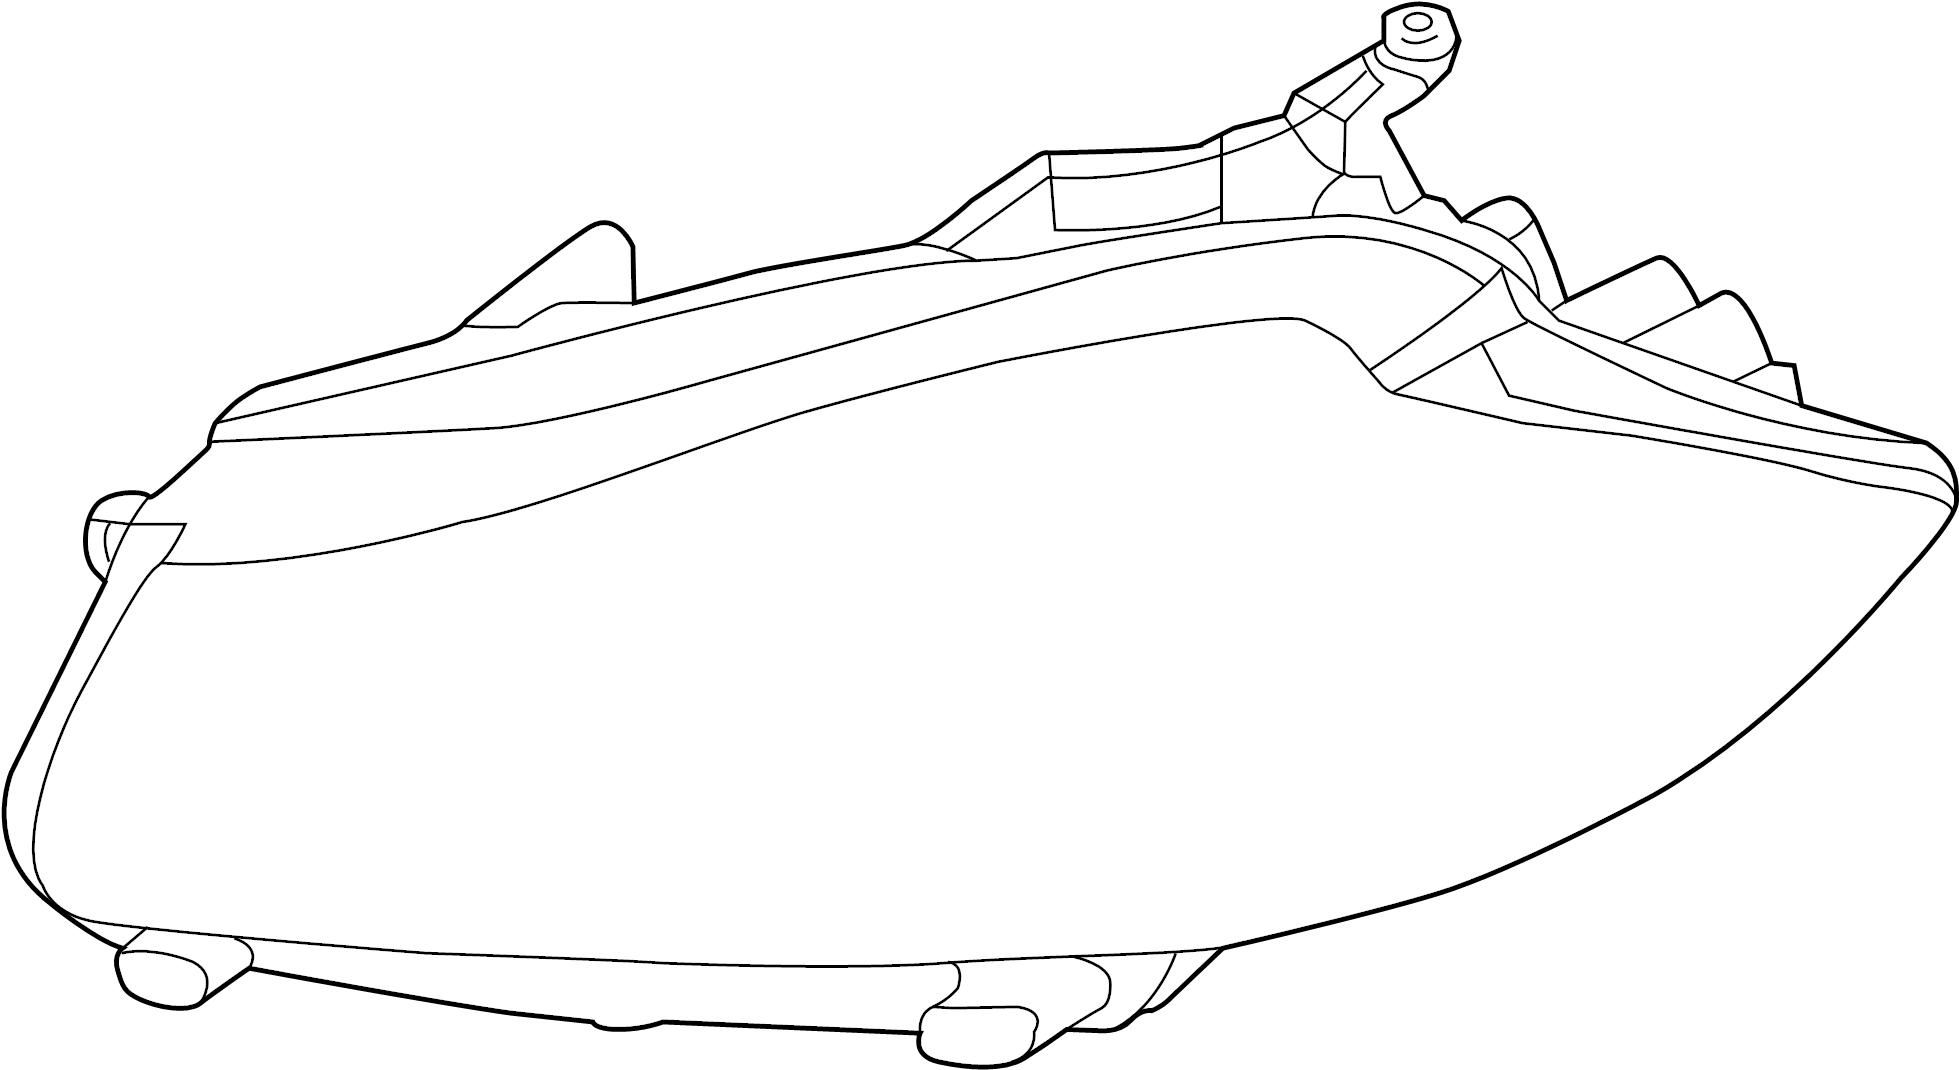 Jaguar XF Headlight Assembly. 2012-15, w/adaptive. XF